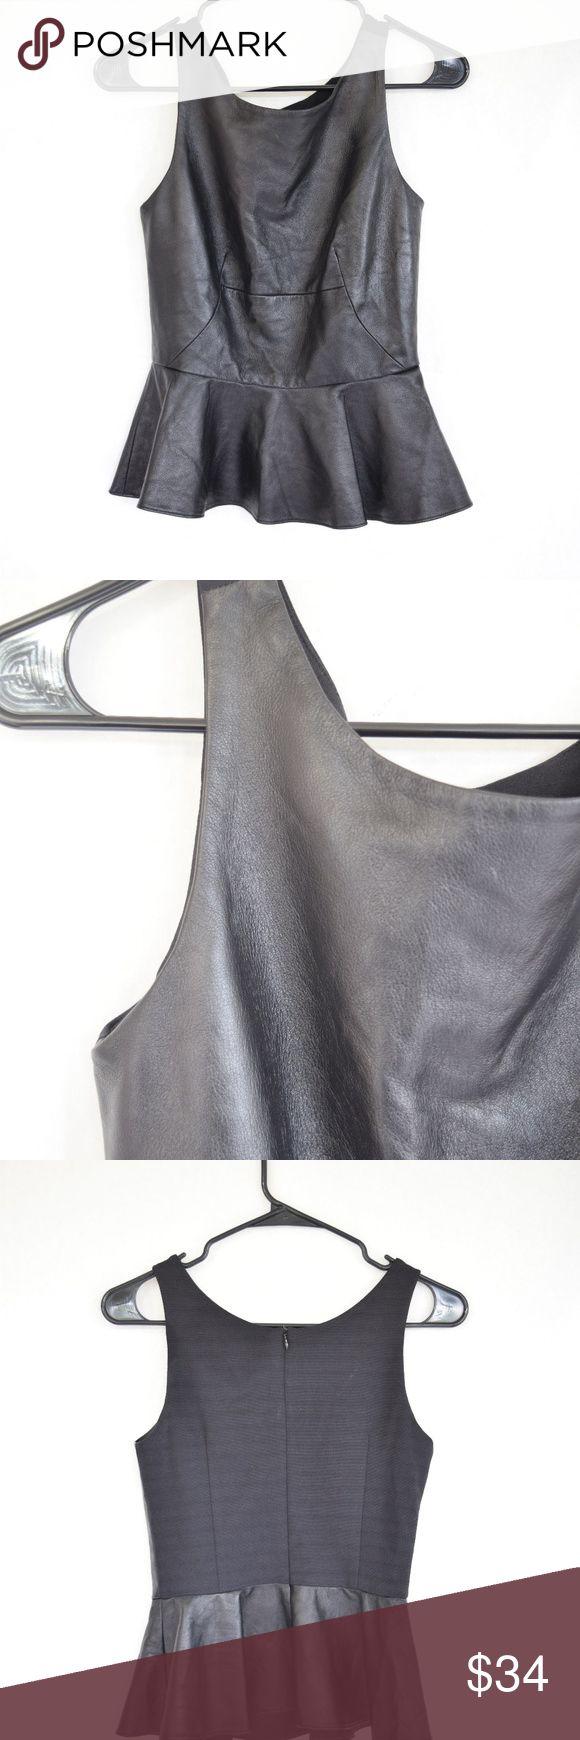 Amanda Uprichard Martini Peplum Top (Sz XS) Amanda Uprichard Martini Leather Peplum Top (Sz XS) Black peplum sleeveless top with contrasting rayon back. Some softening & wear from use. Amanda Uprichard Tops Blouses